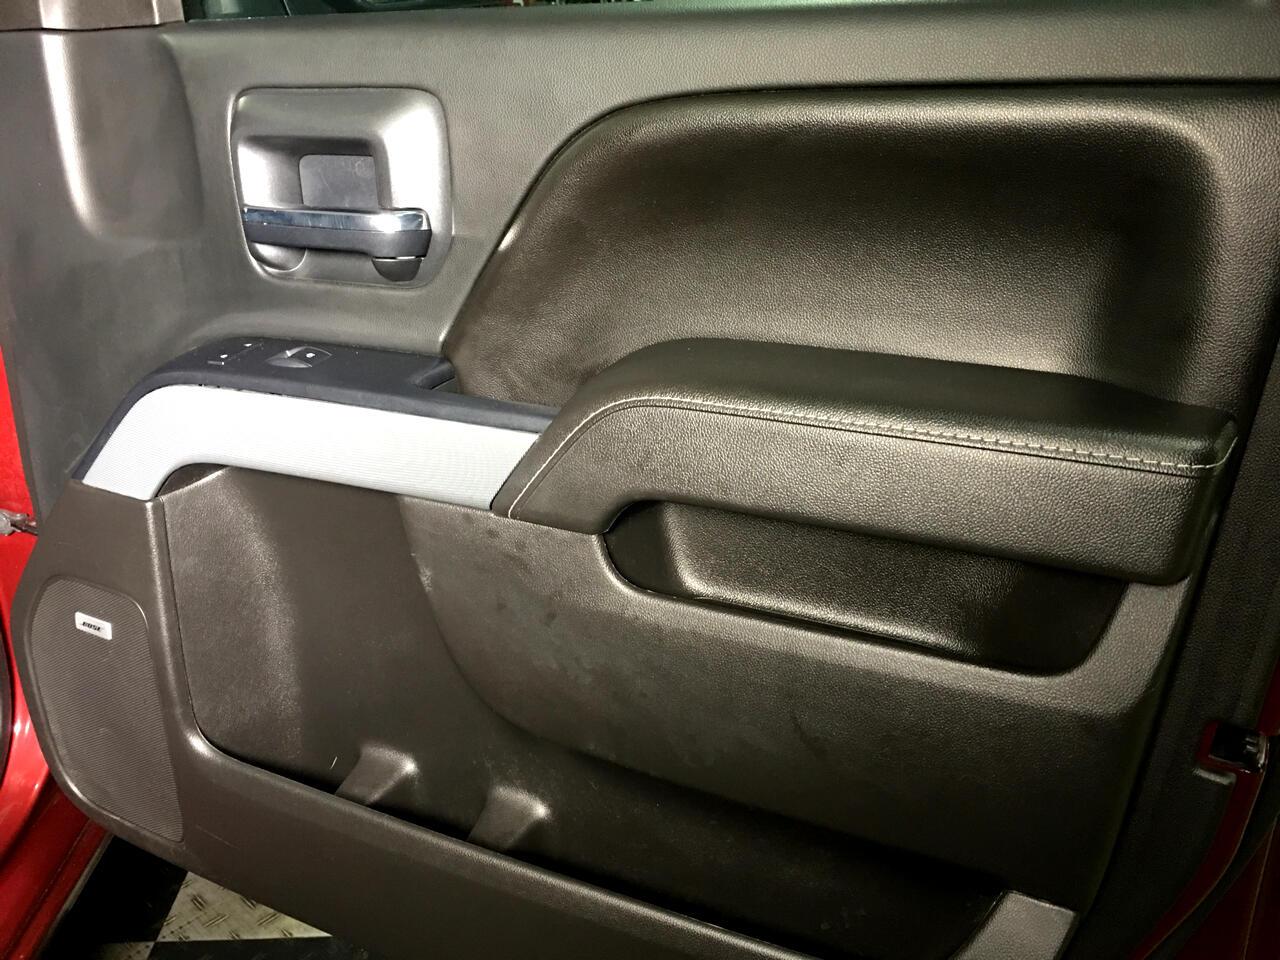 Pre-Owned 2016 Chevrolet Silverado 1500 4WD Double Cab 143.5 in LT w/2LT